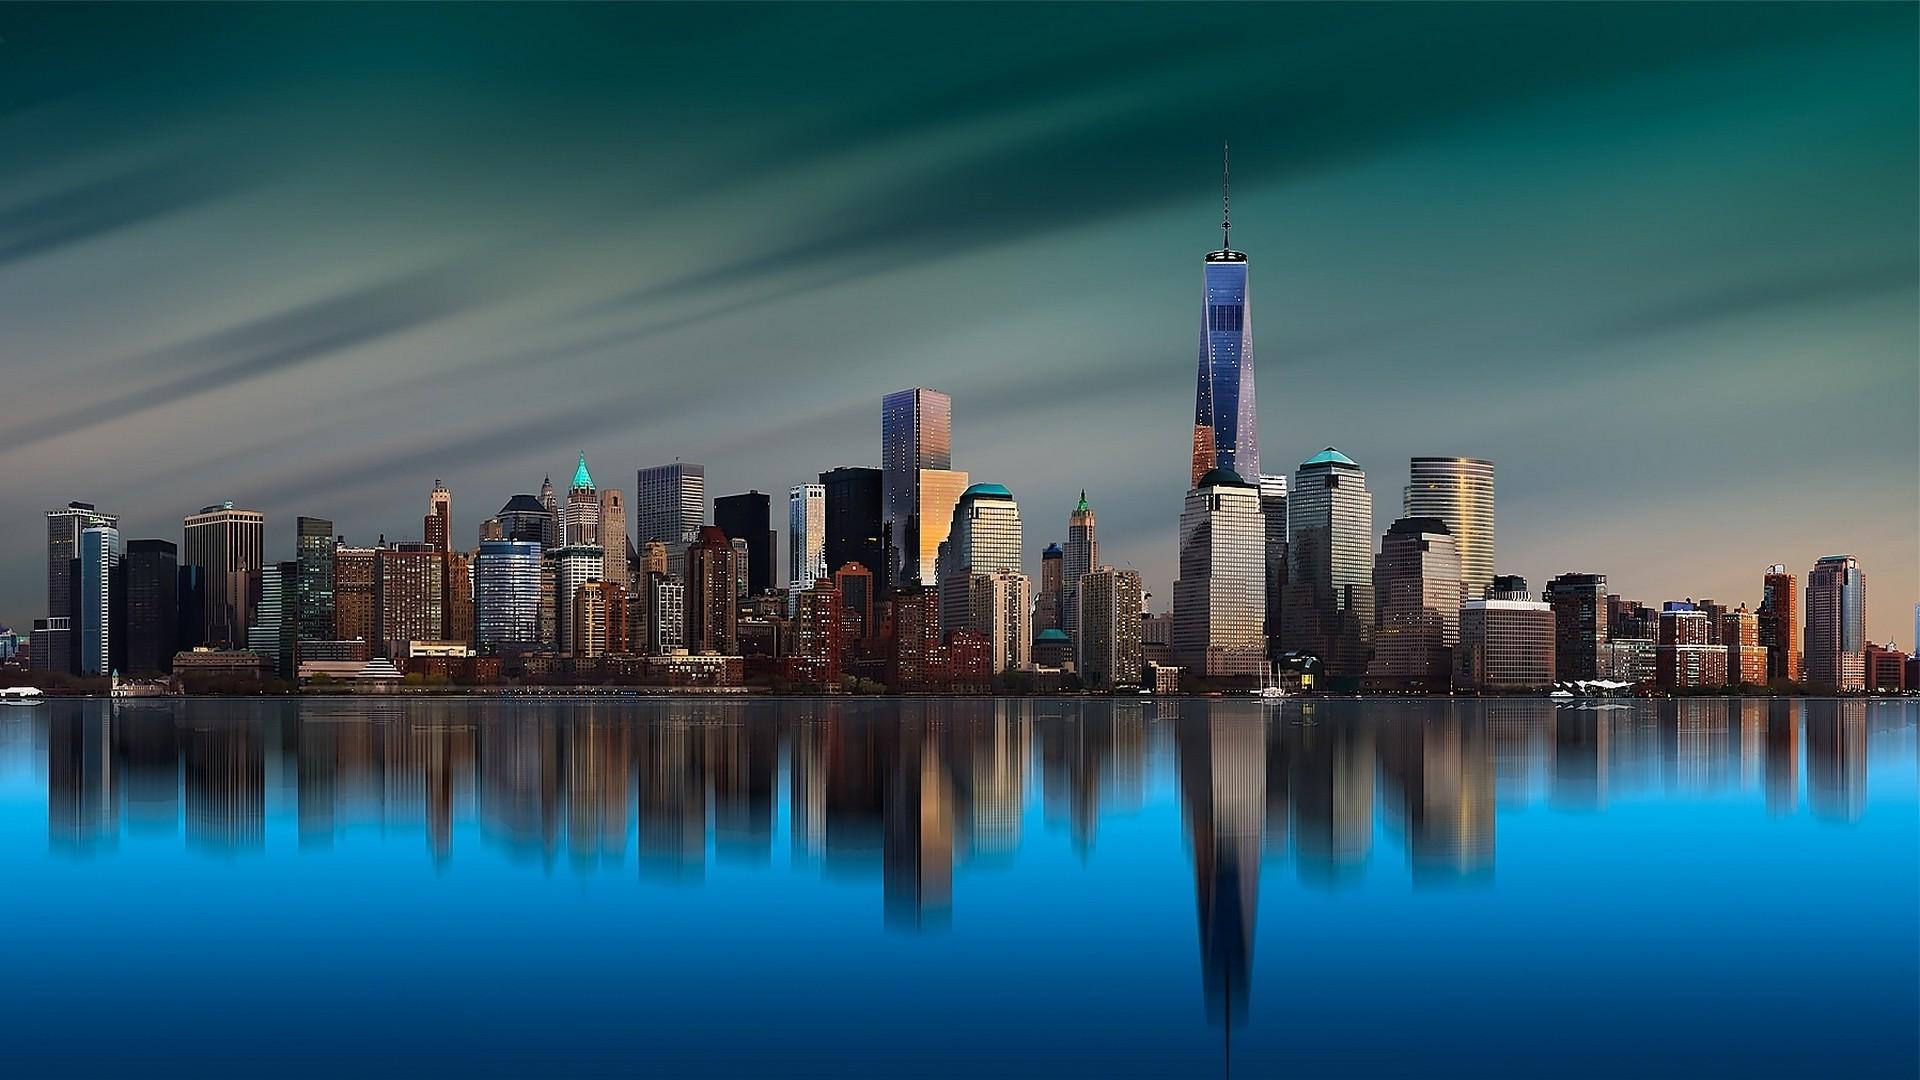 landscape, Architecture, World Trade Center, New York City, Manhattan,  Island, Skyscraper, Metropolis, Building, Reflection, Sunrise, Calm, Sea,  Water, …